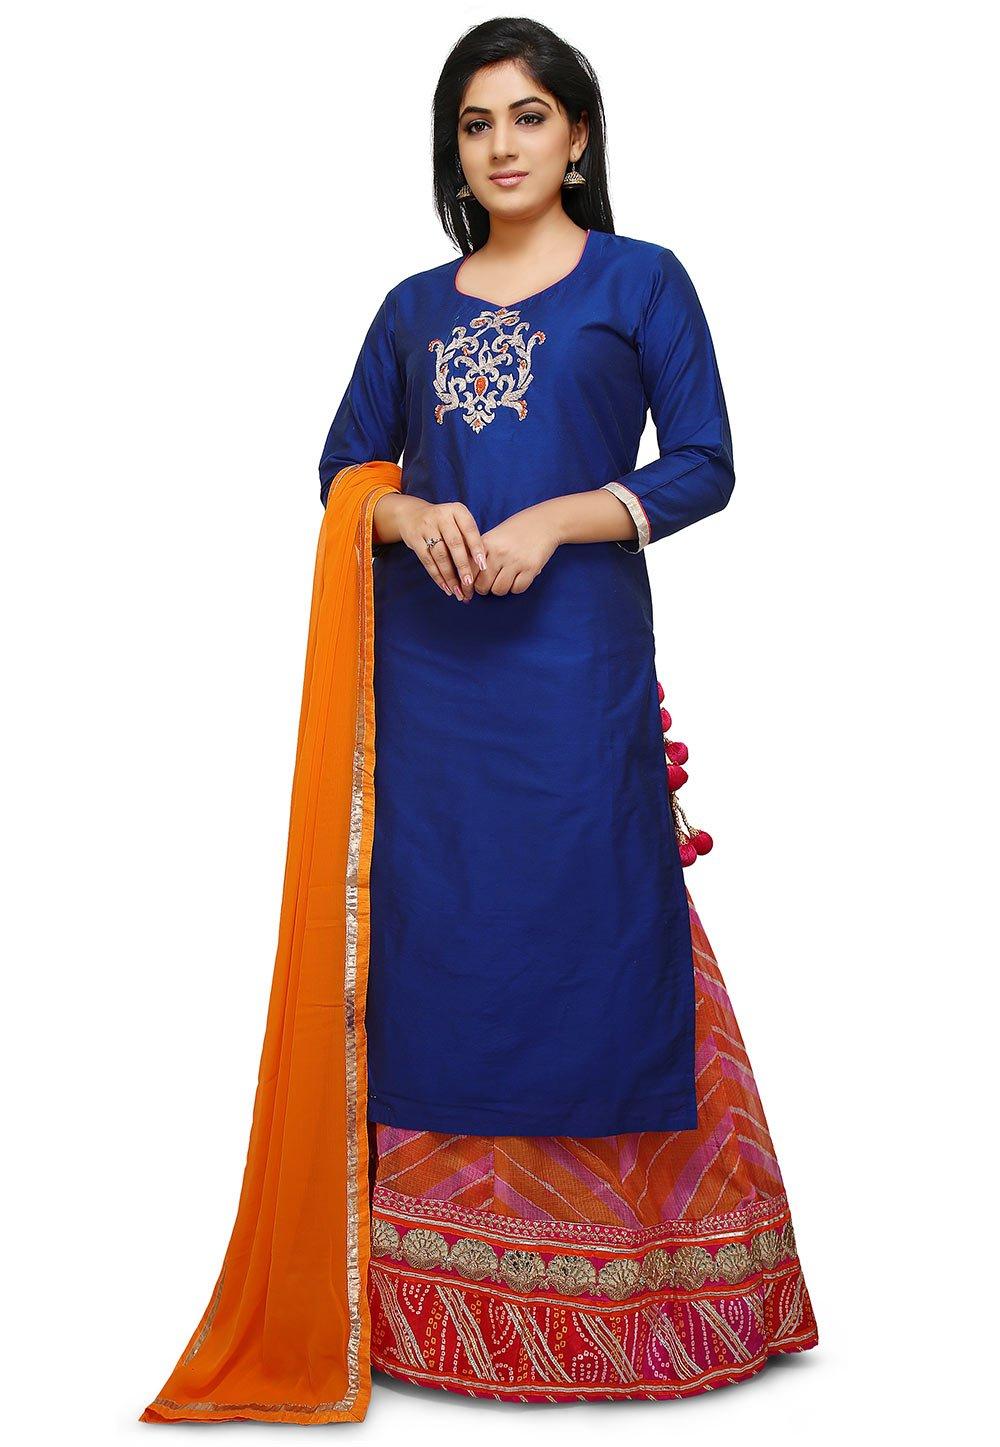 Utsav Fashion Embroidered Cotton Silk Lehenga in Royal Blue